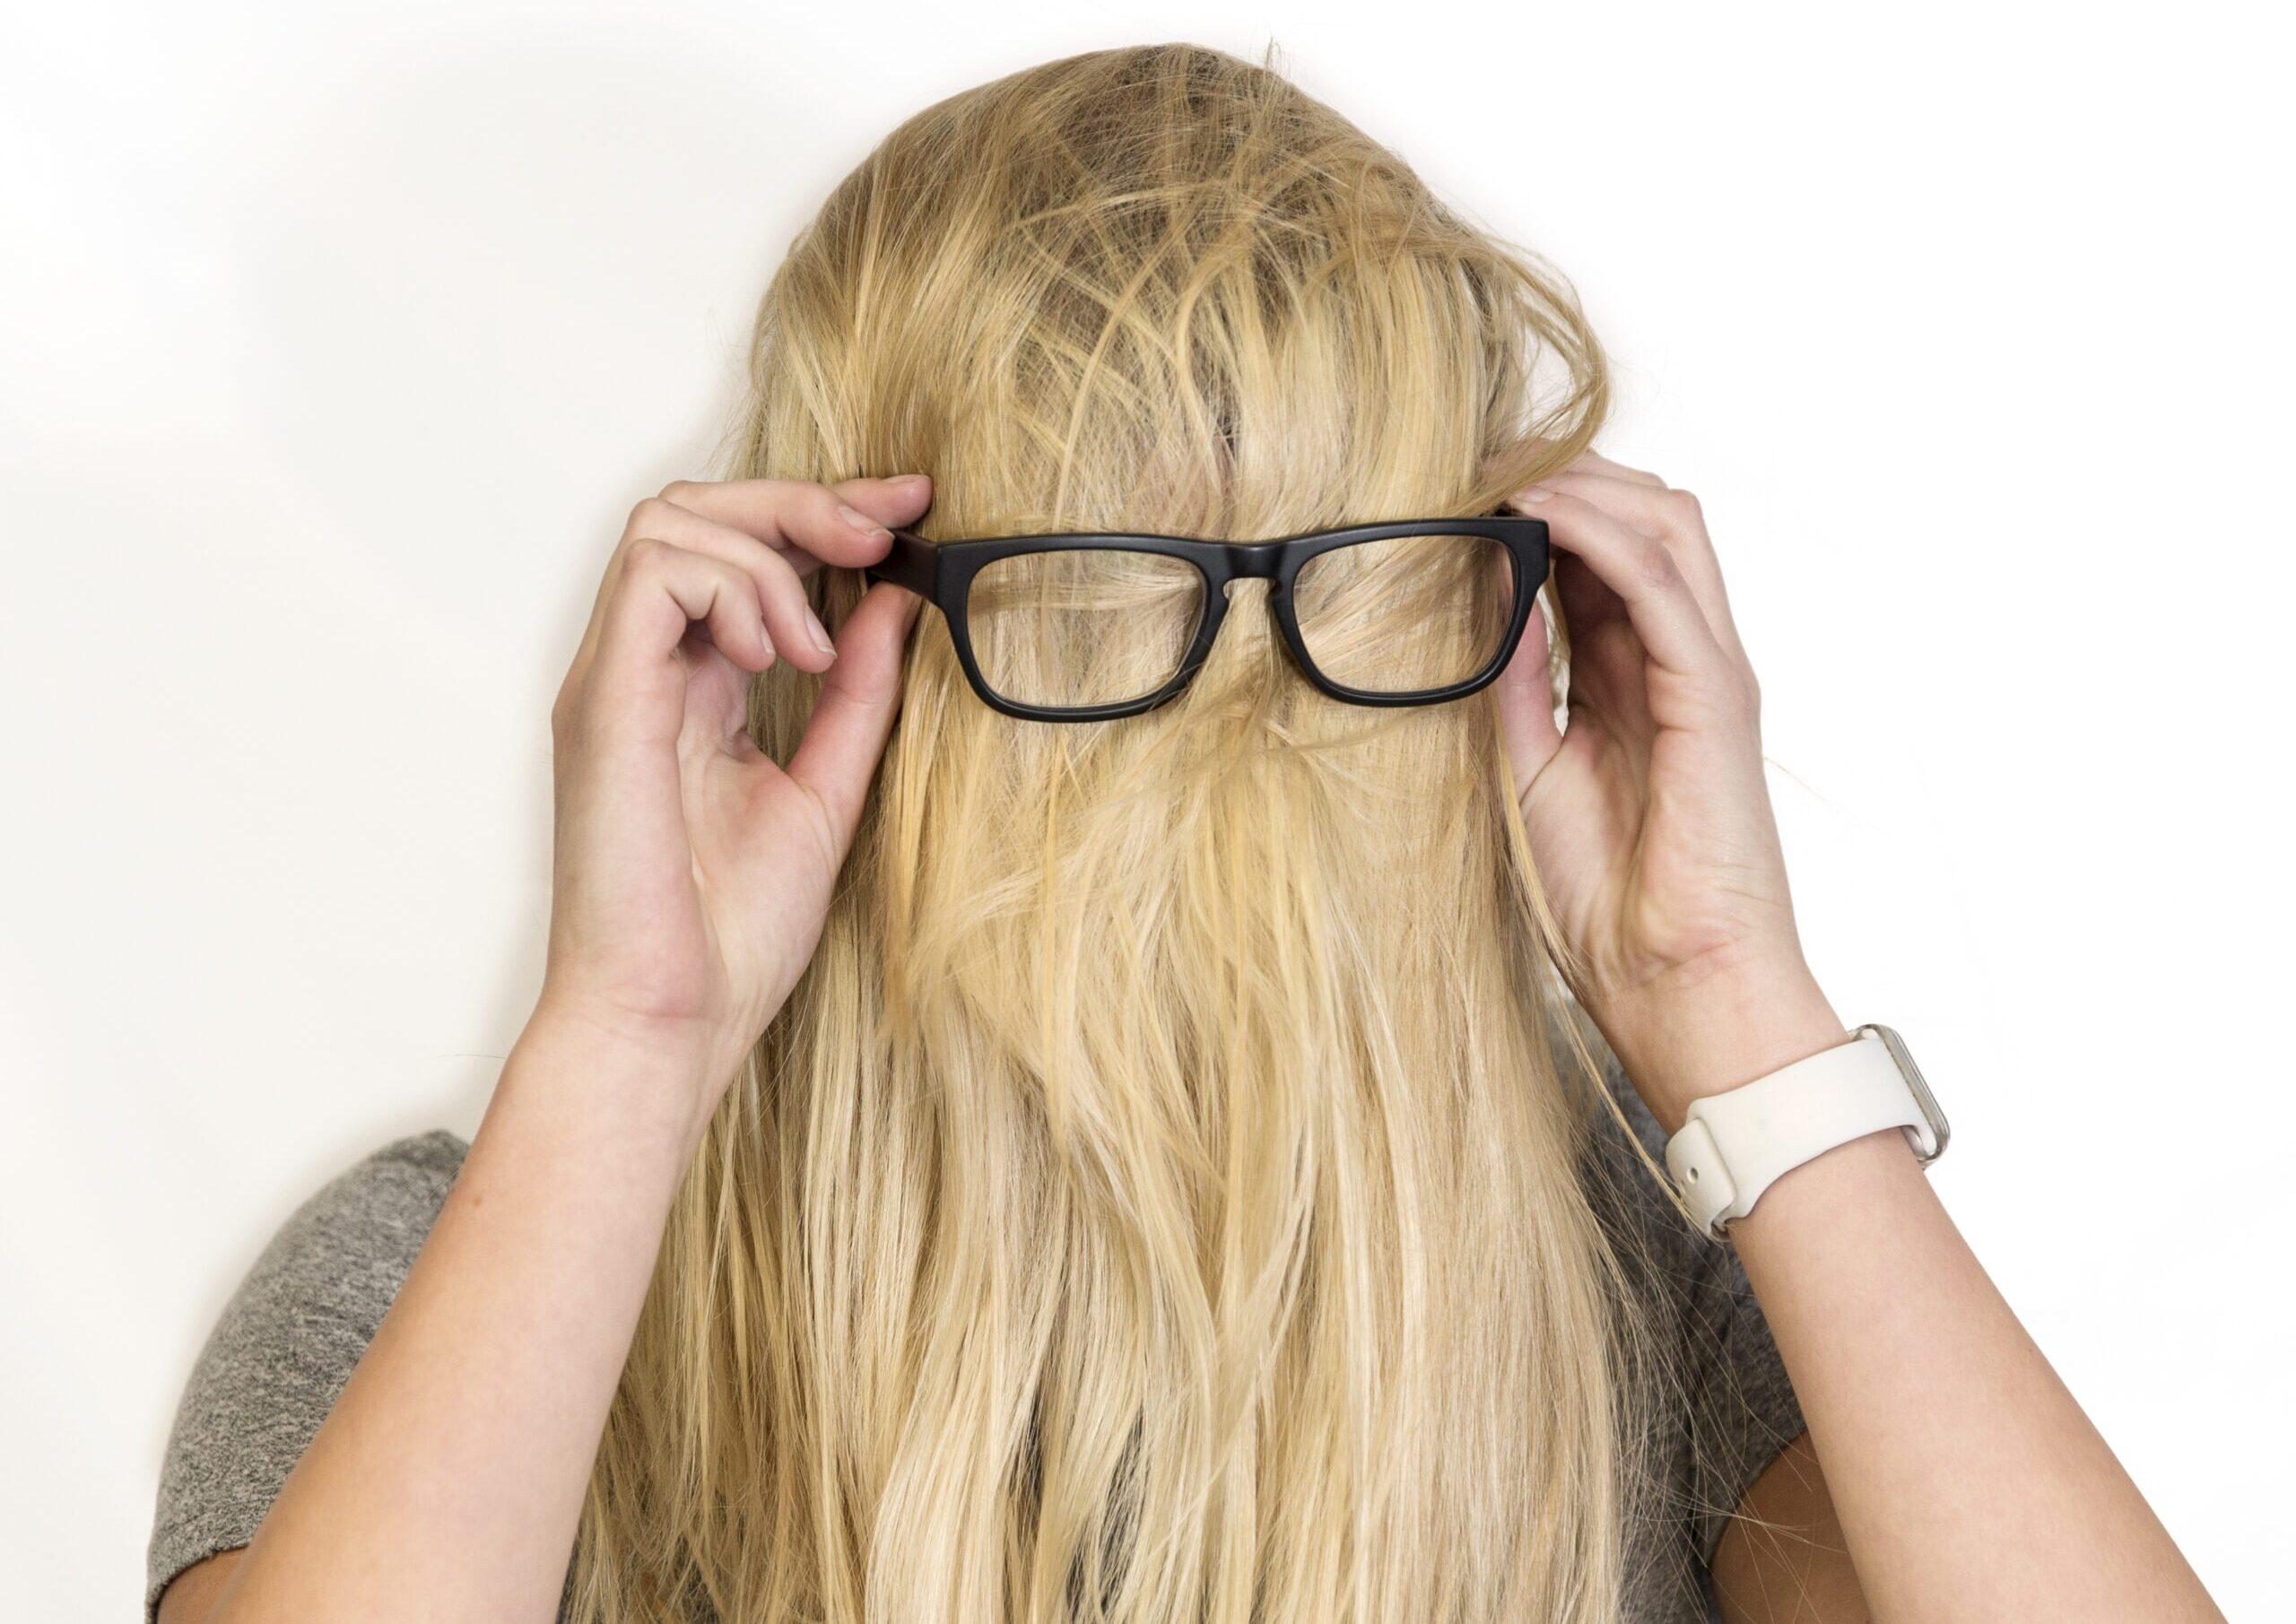 Jenna Spero Headshot 1